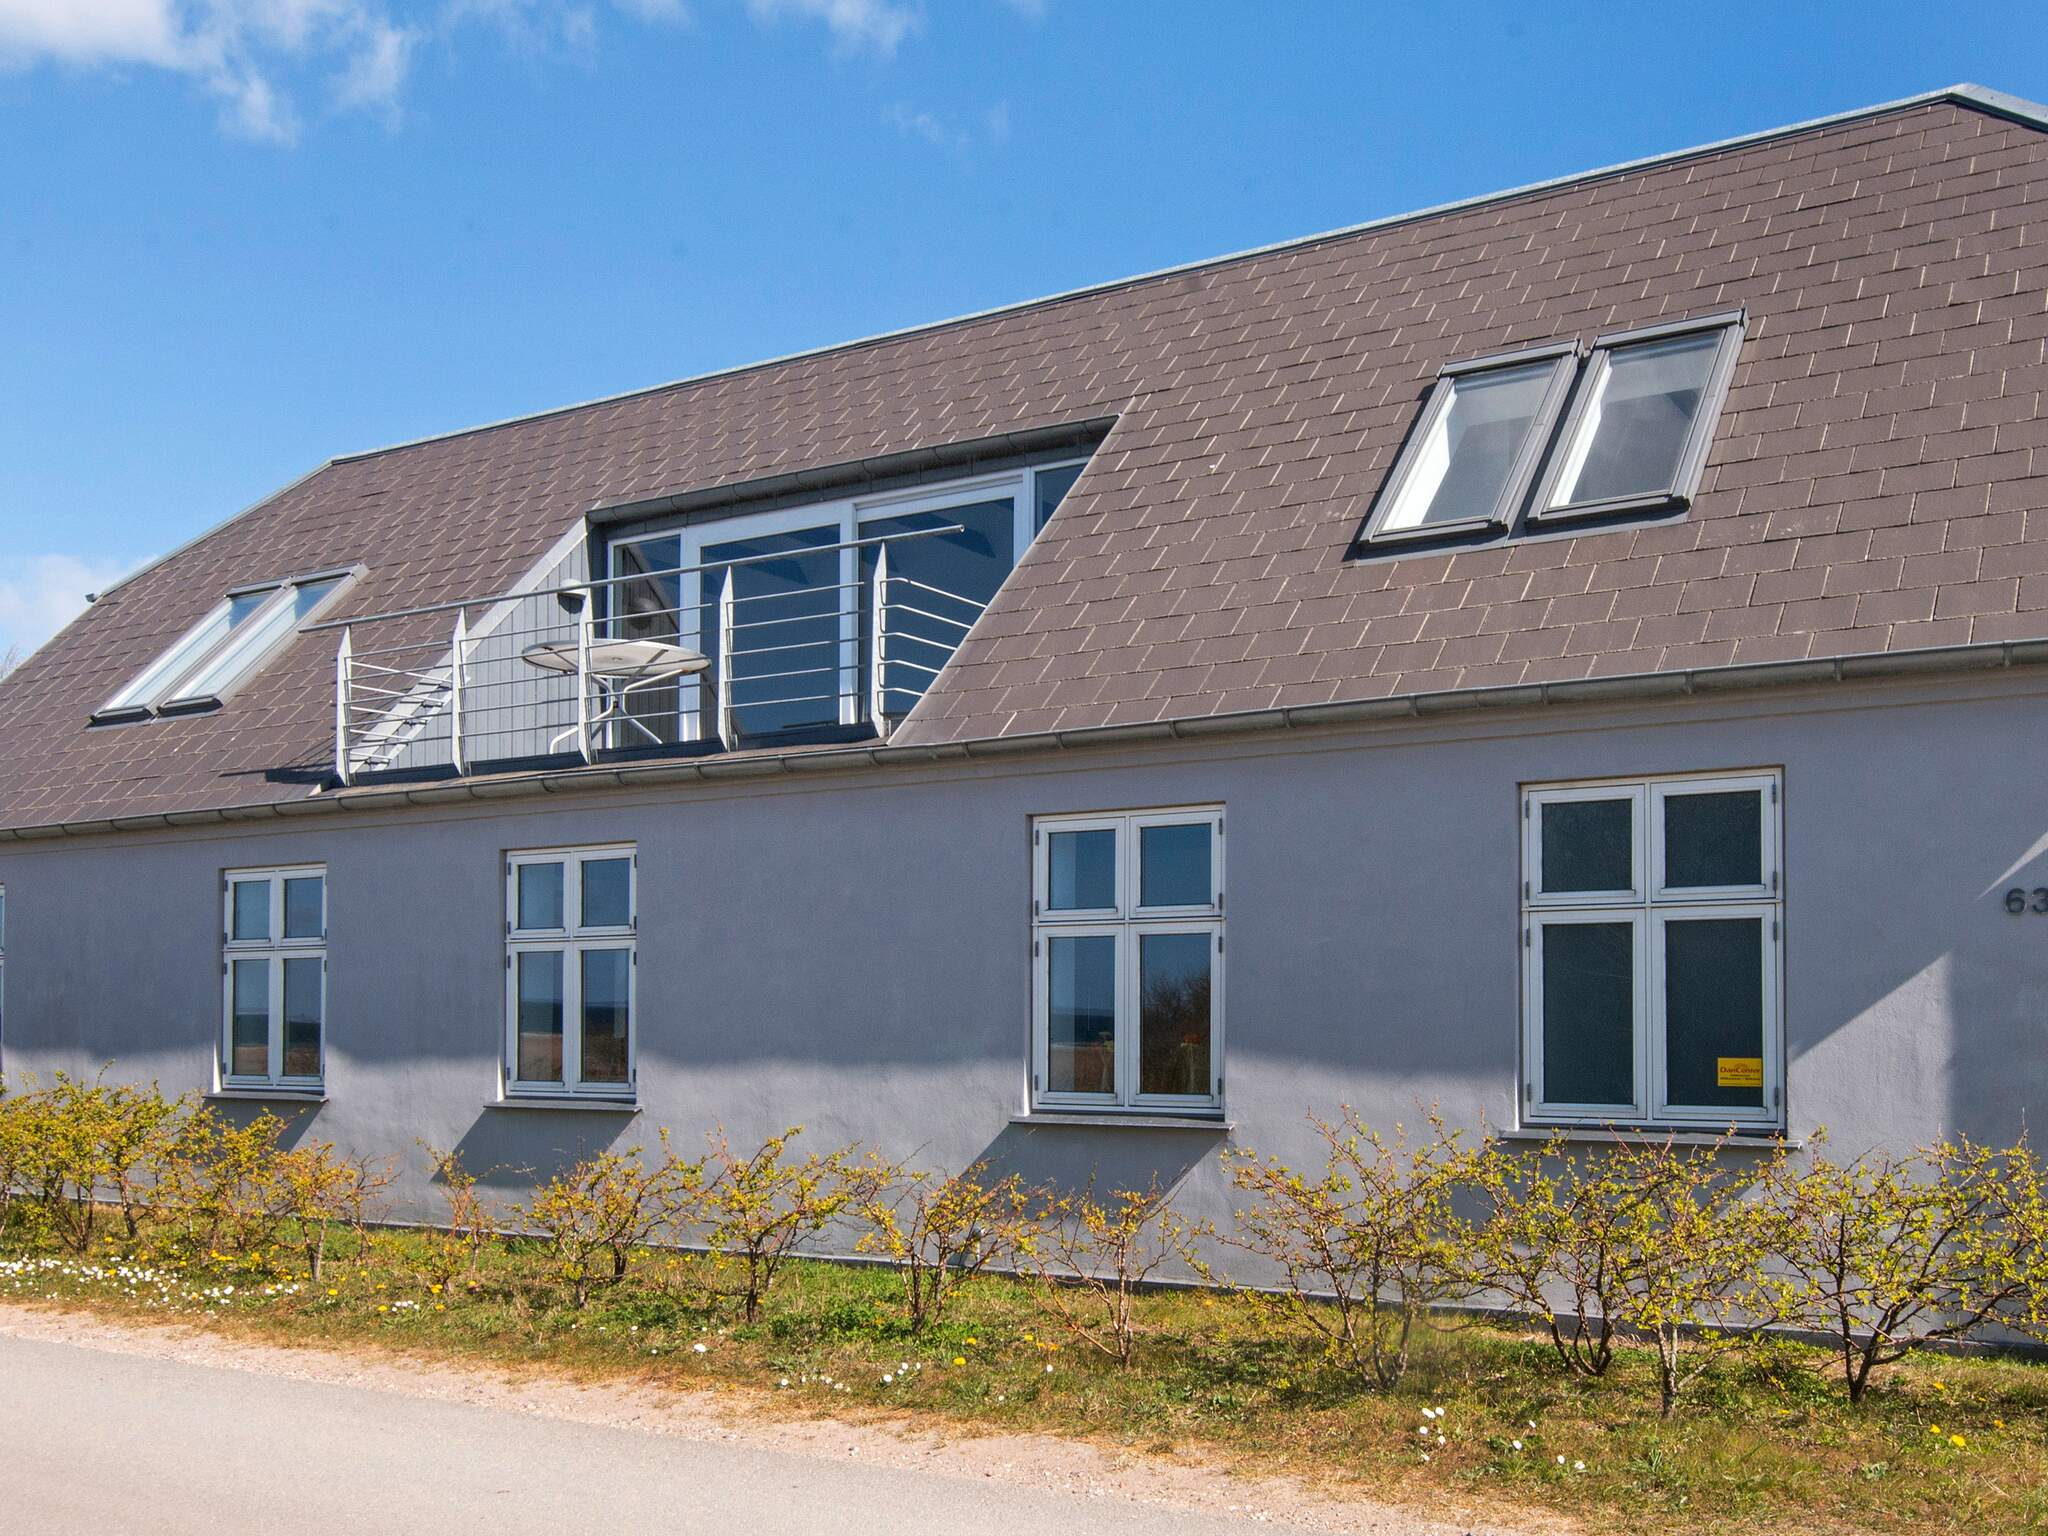 Maison de vacances Helgenæs (590964), Knebel, , Mer Baltique danoise, Danemark, image 23